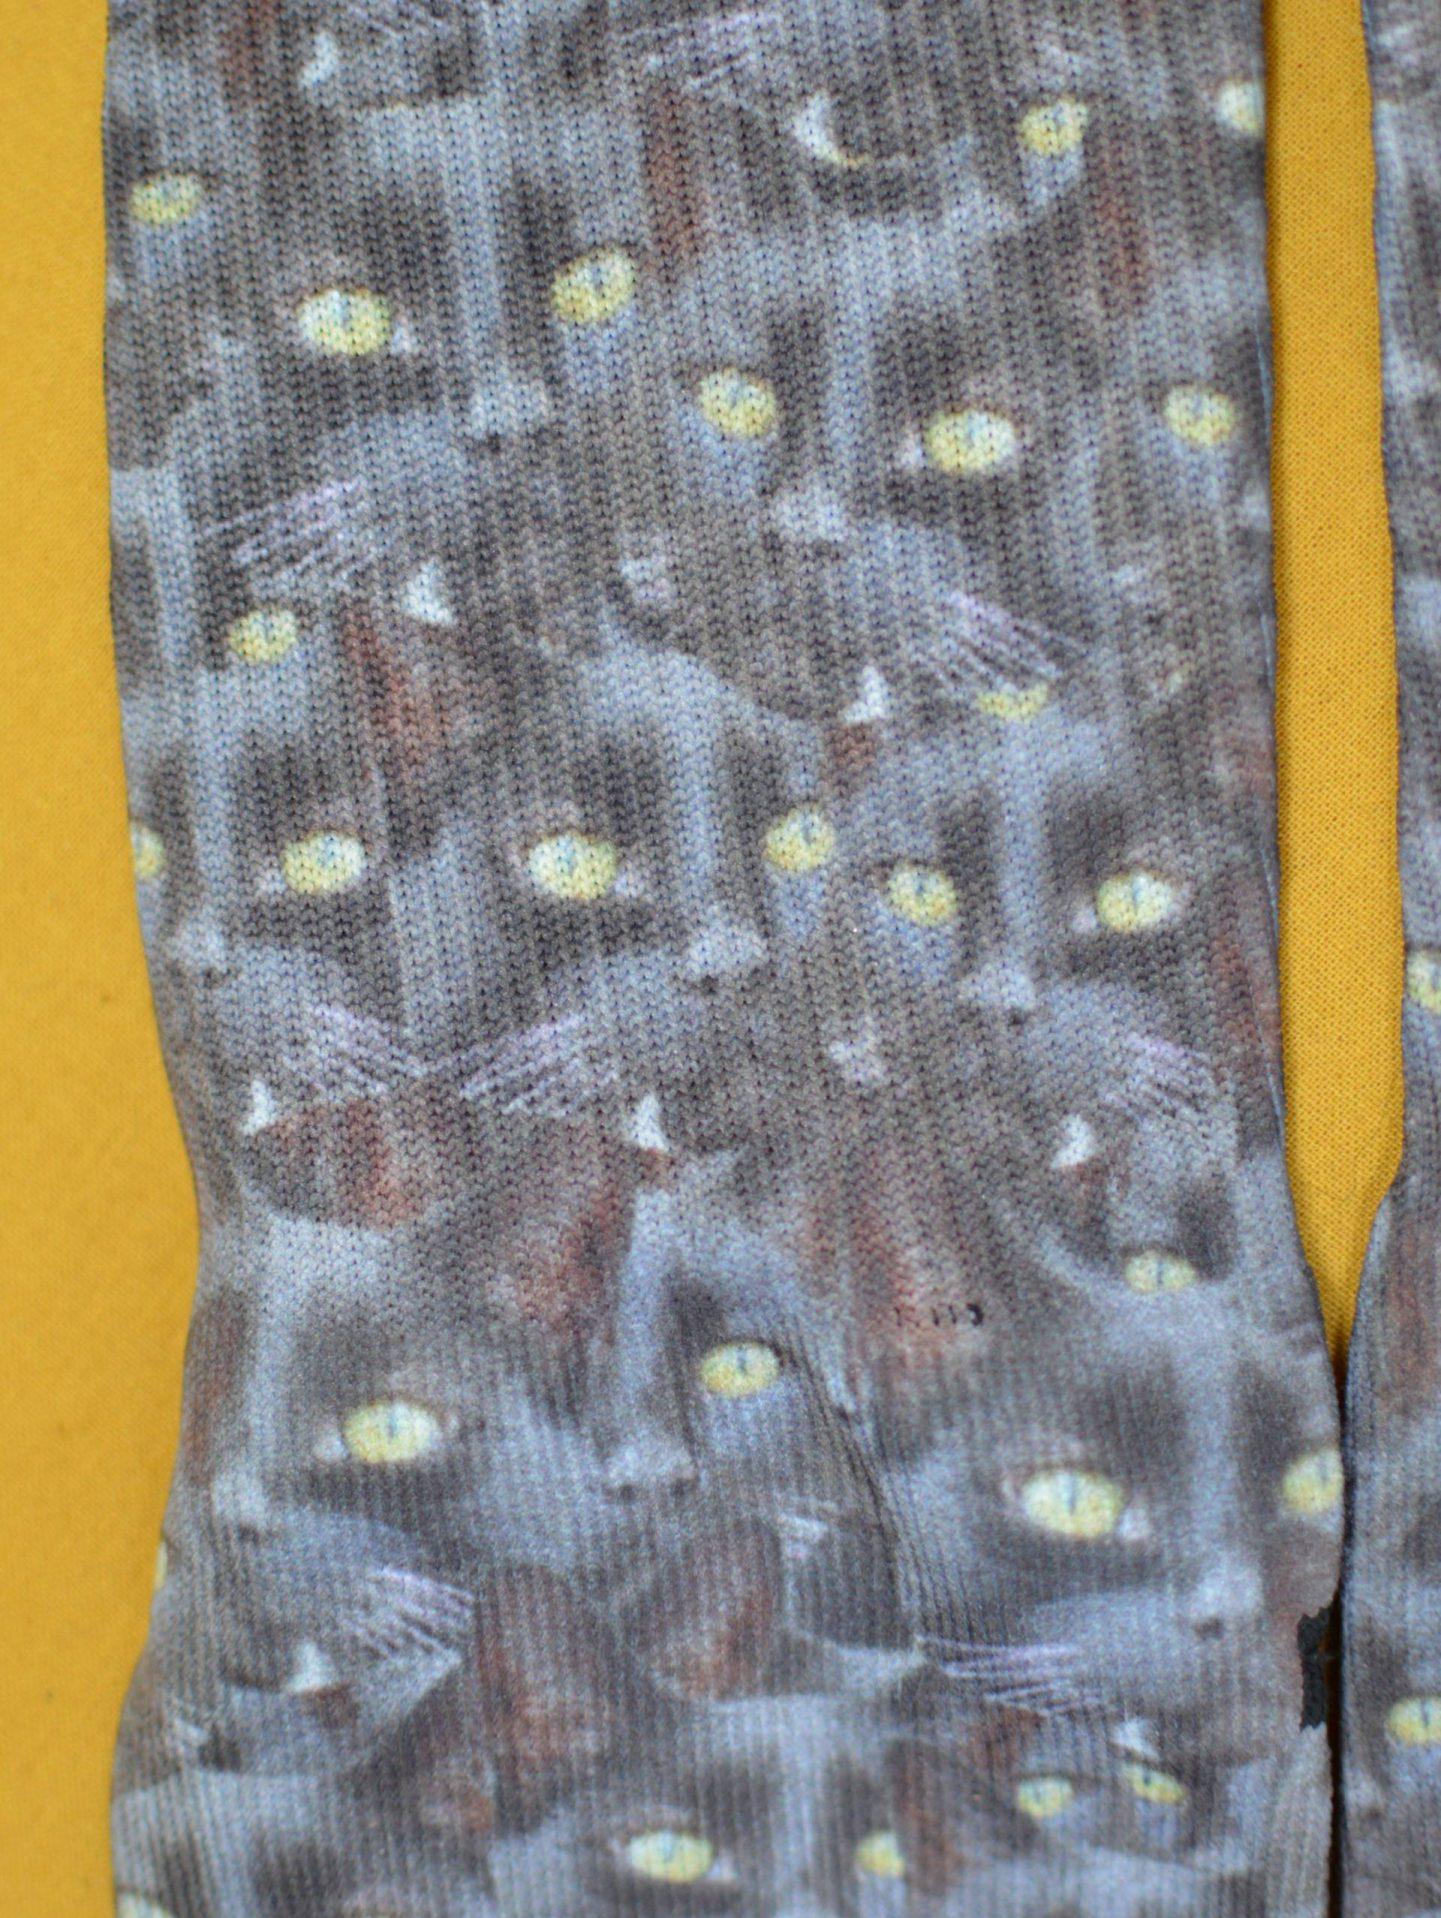 Printsfield cat mash personalised socks